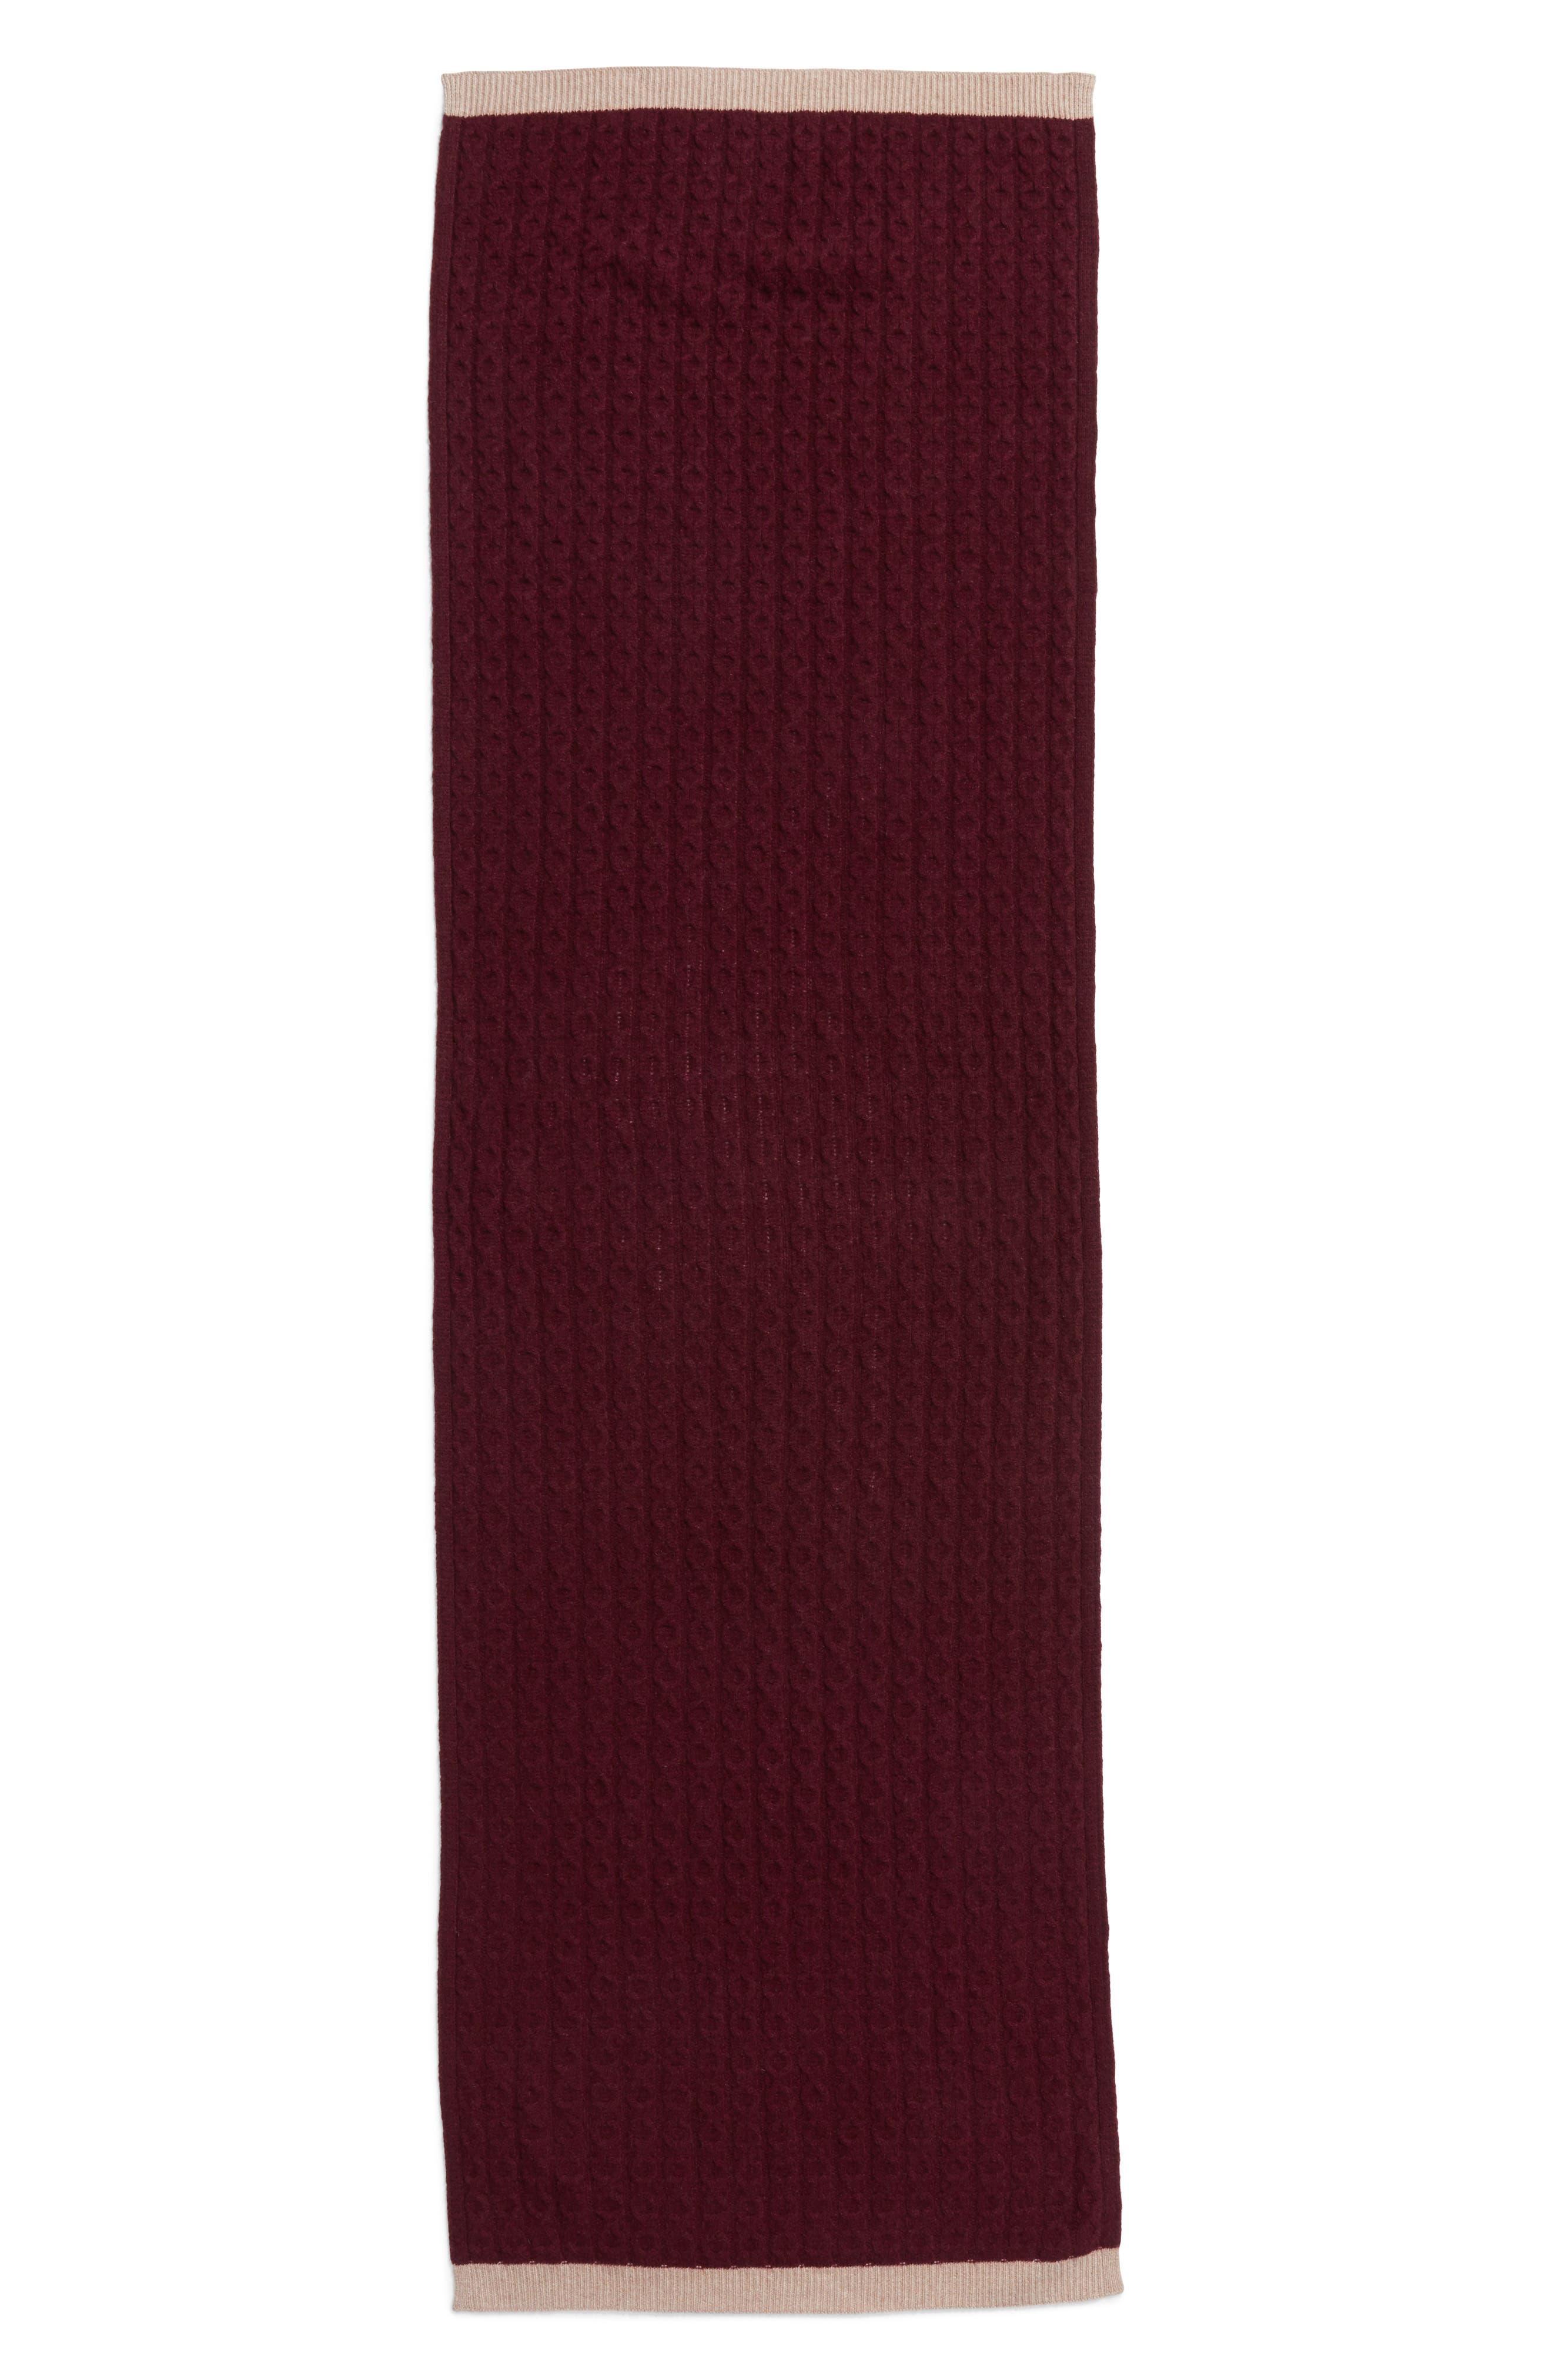 Alternate Image 2  - Halogen® Cable Knit Cashmere Scarf